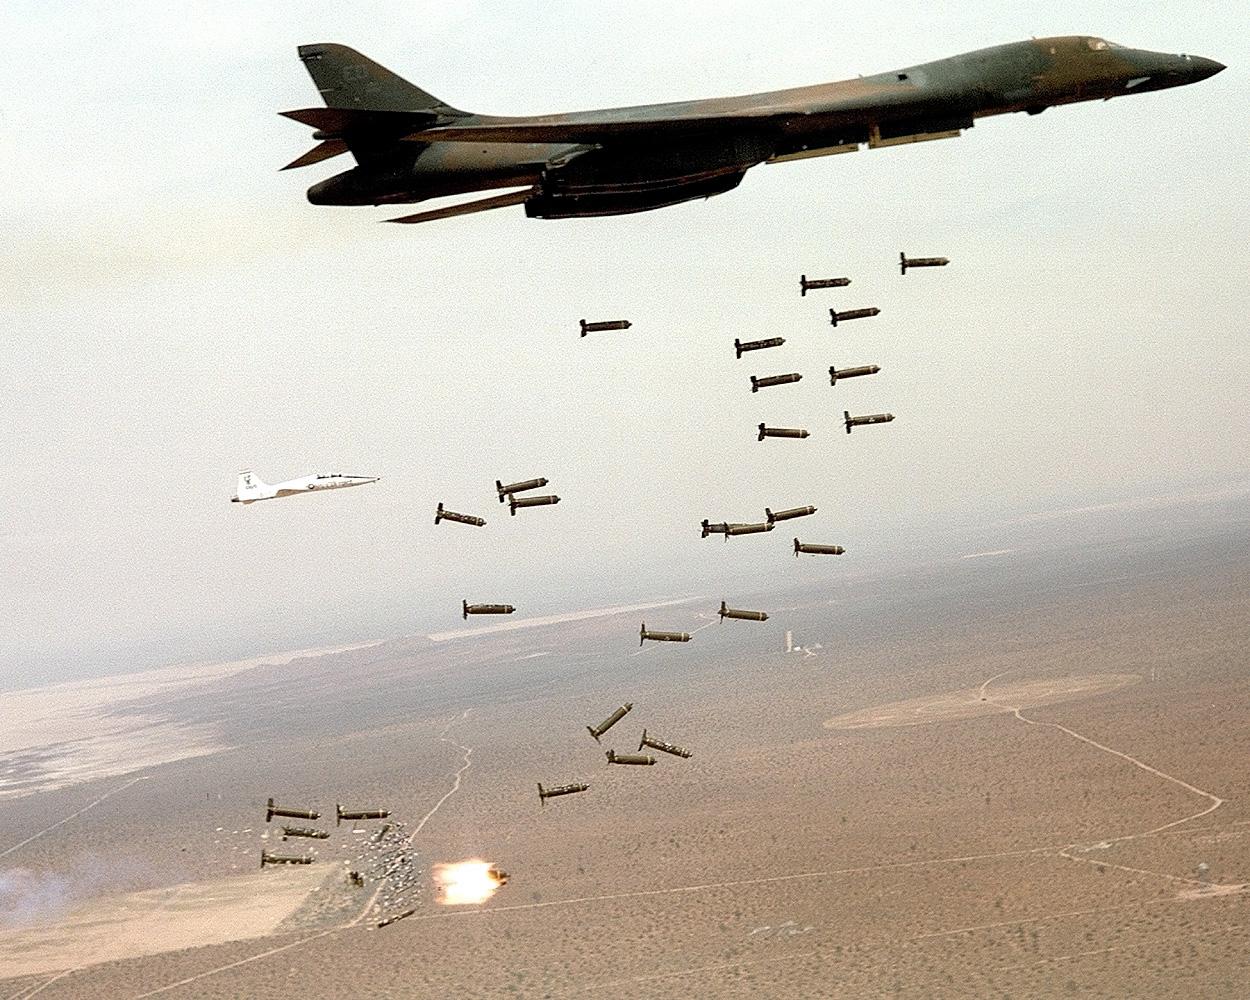 Cluster bomb dari sumber creative common wikipedia.org